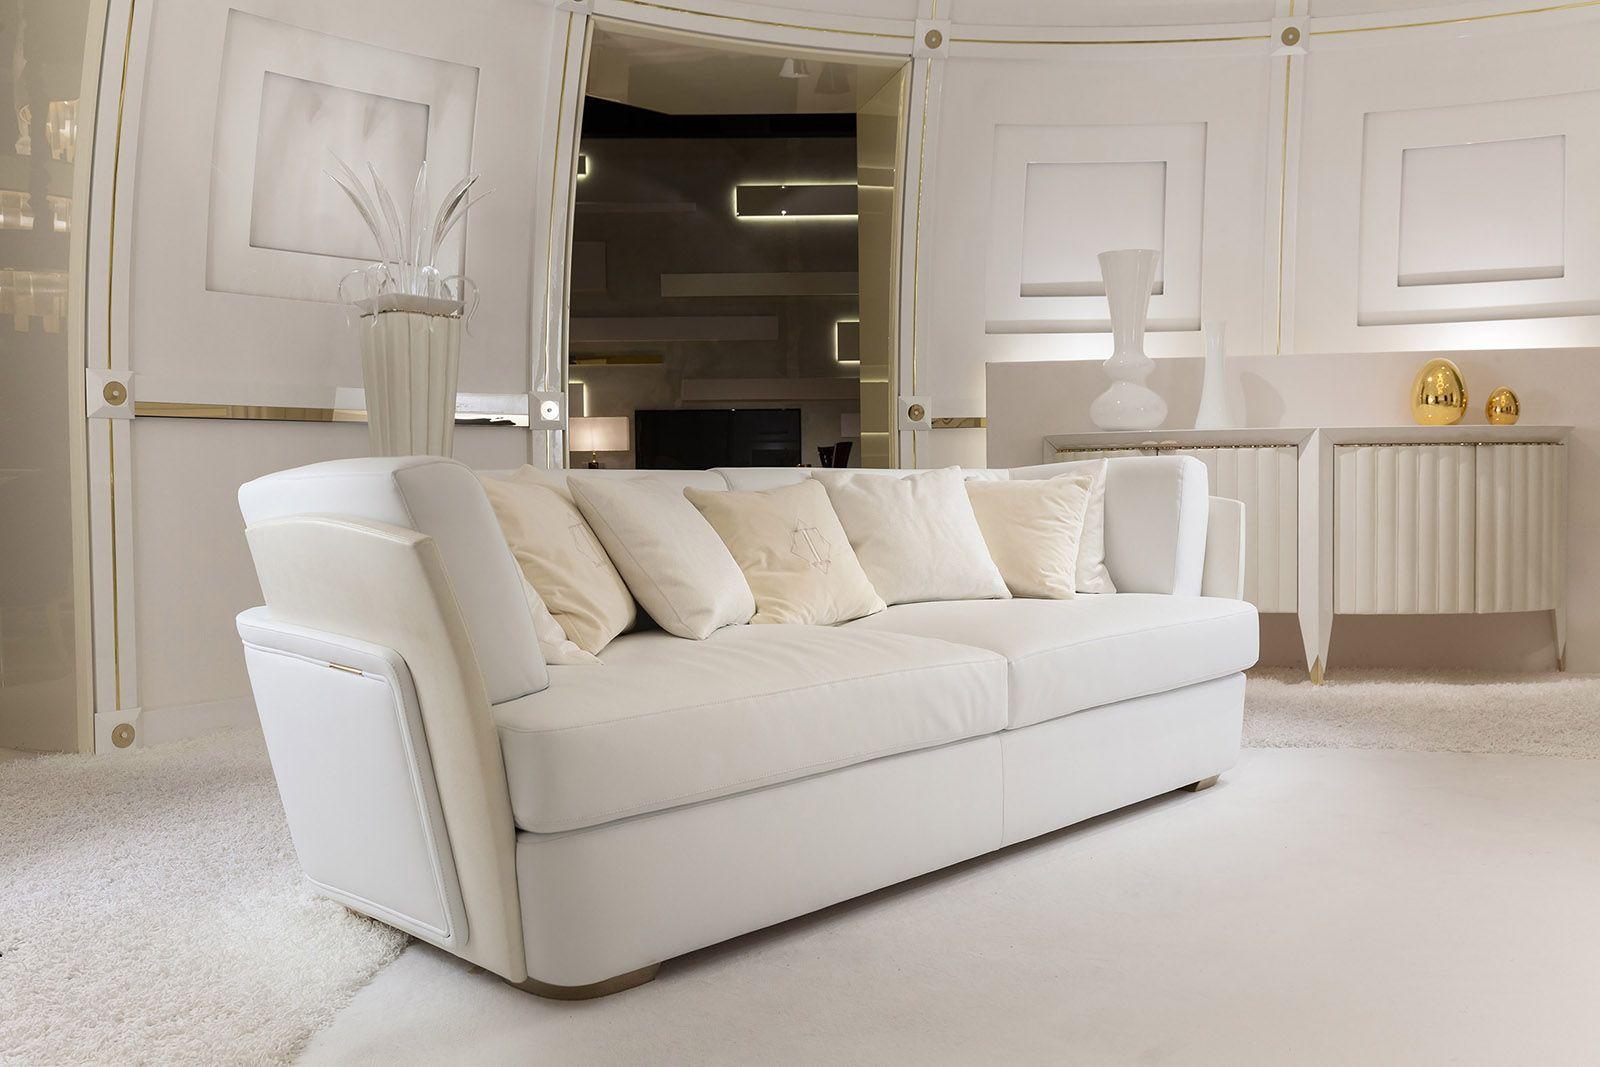 Lusso Mobili ~ Blanche collection www.turri.it italian luxury sofa the art of